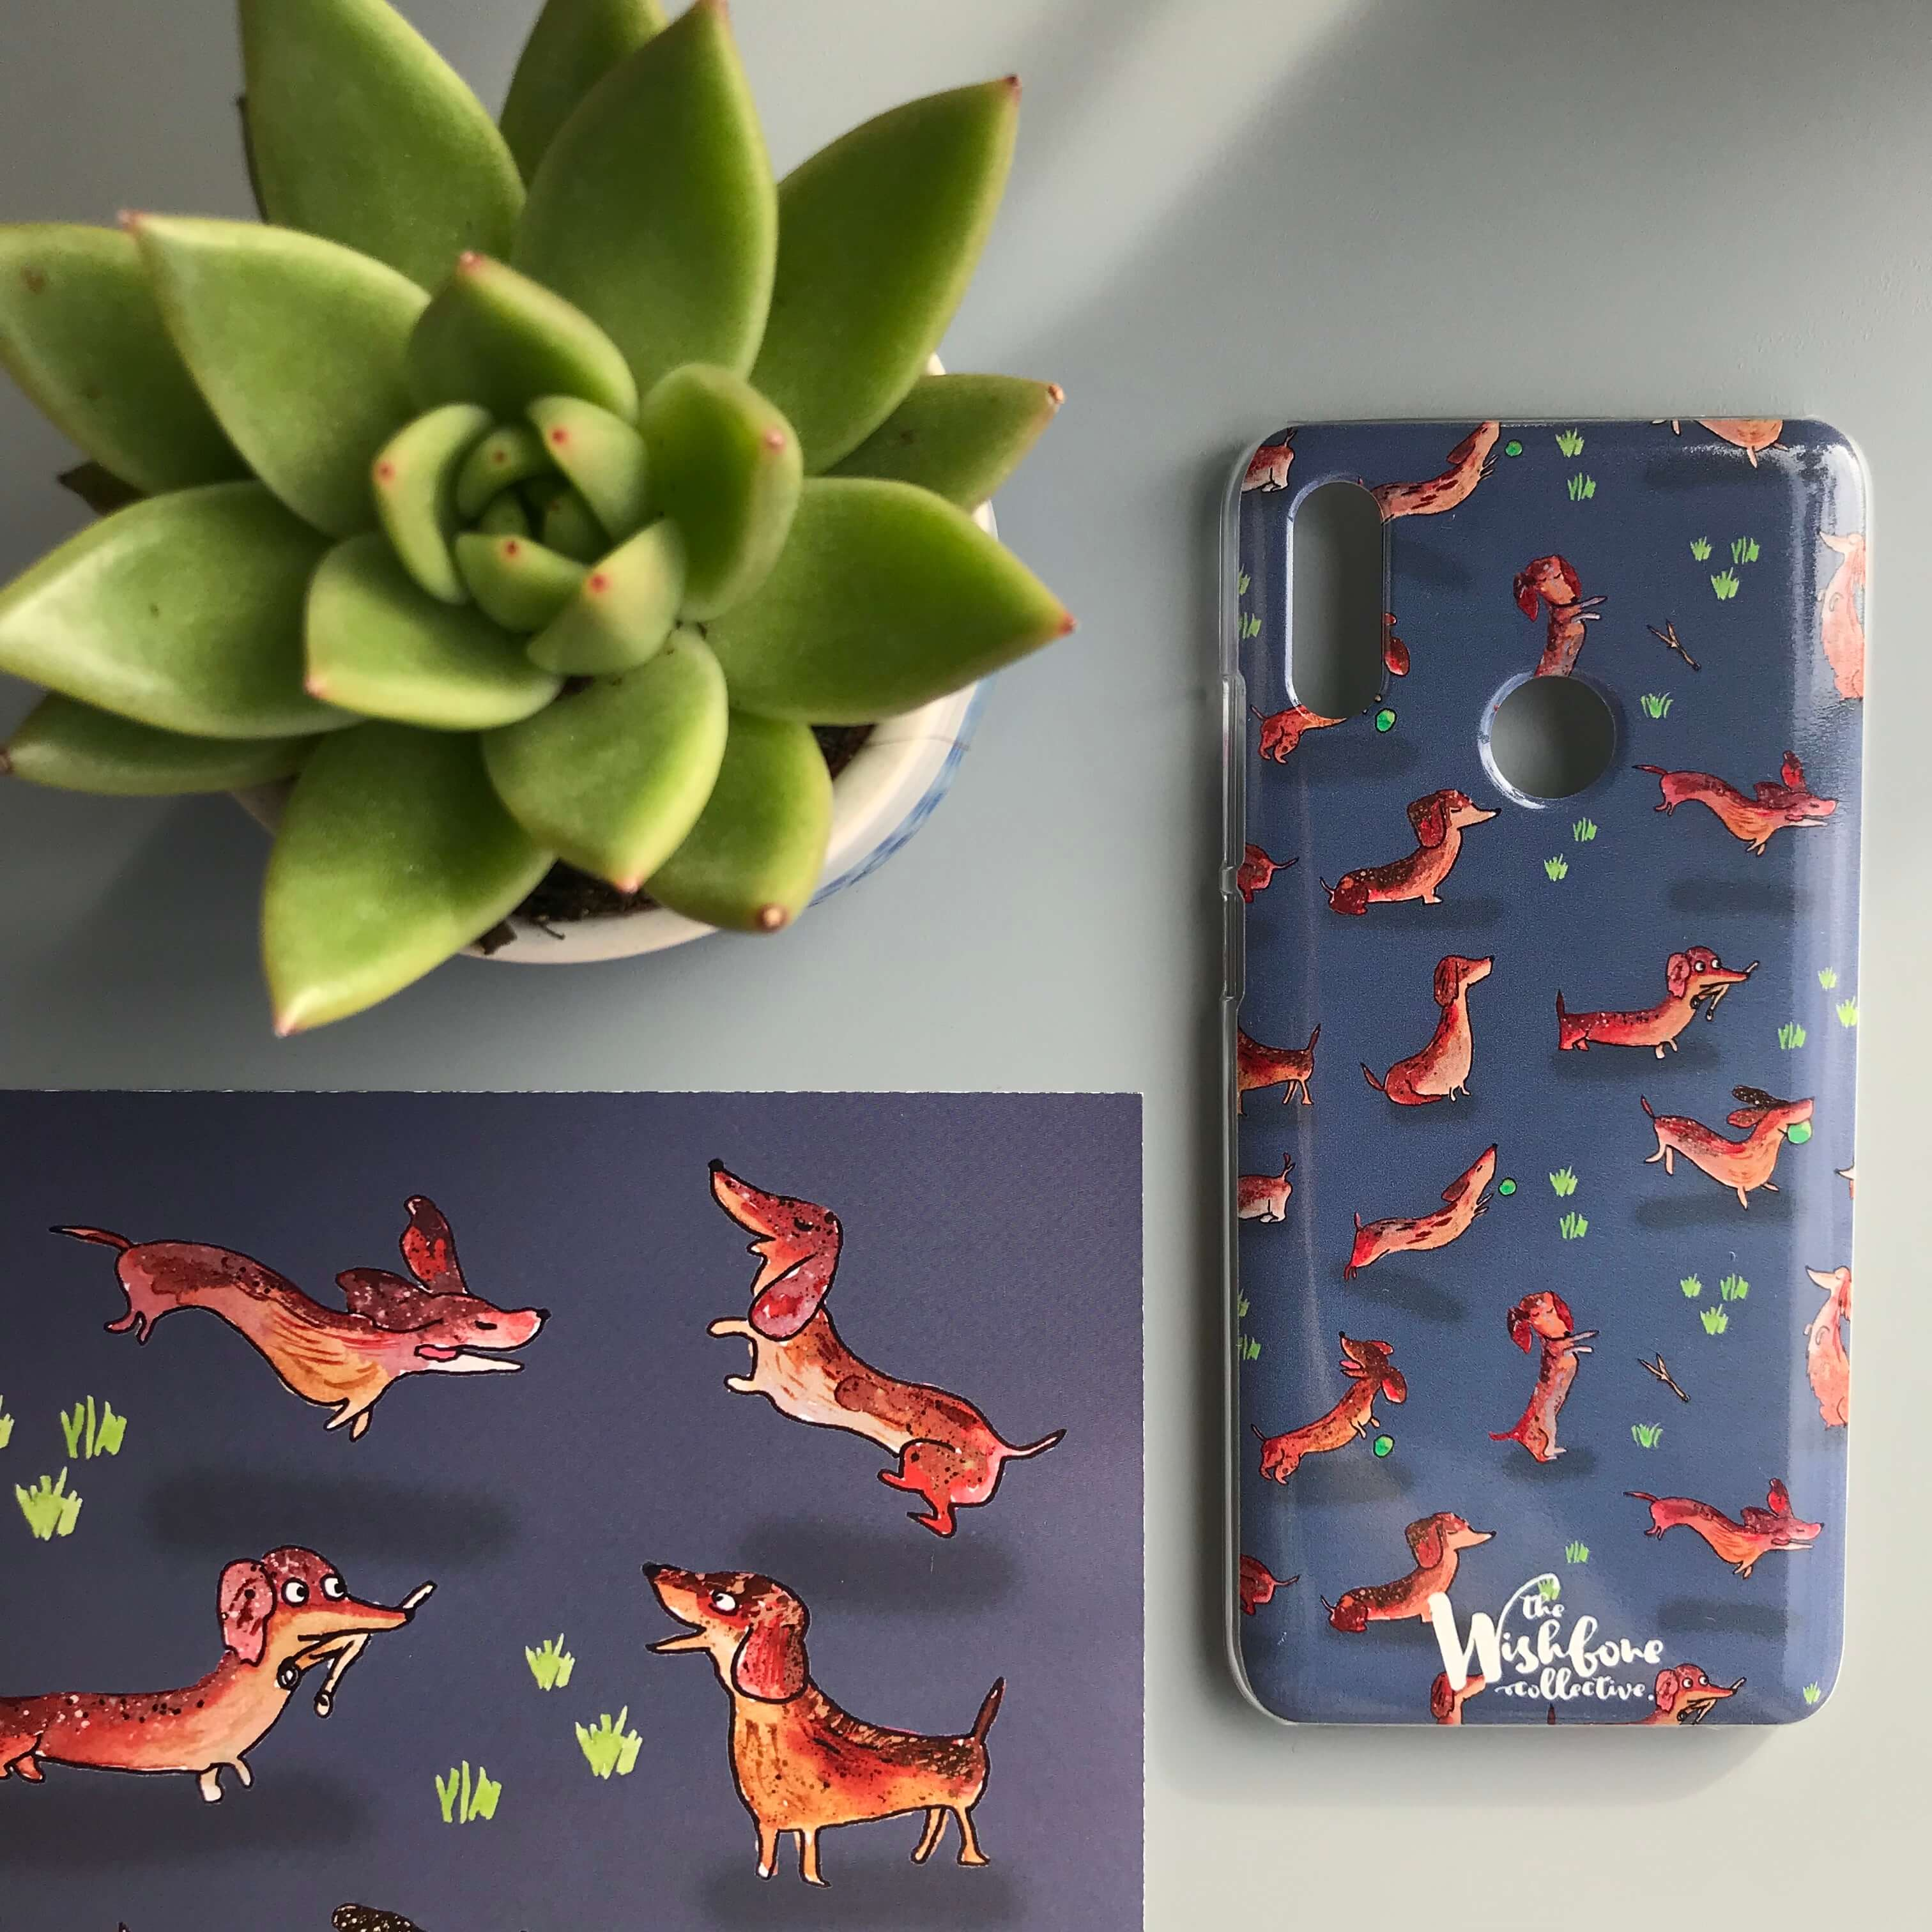 dachshund sausage dog phone case